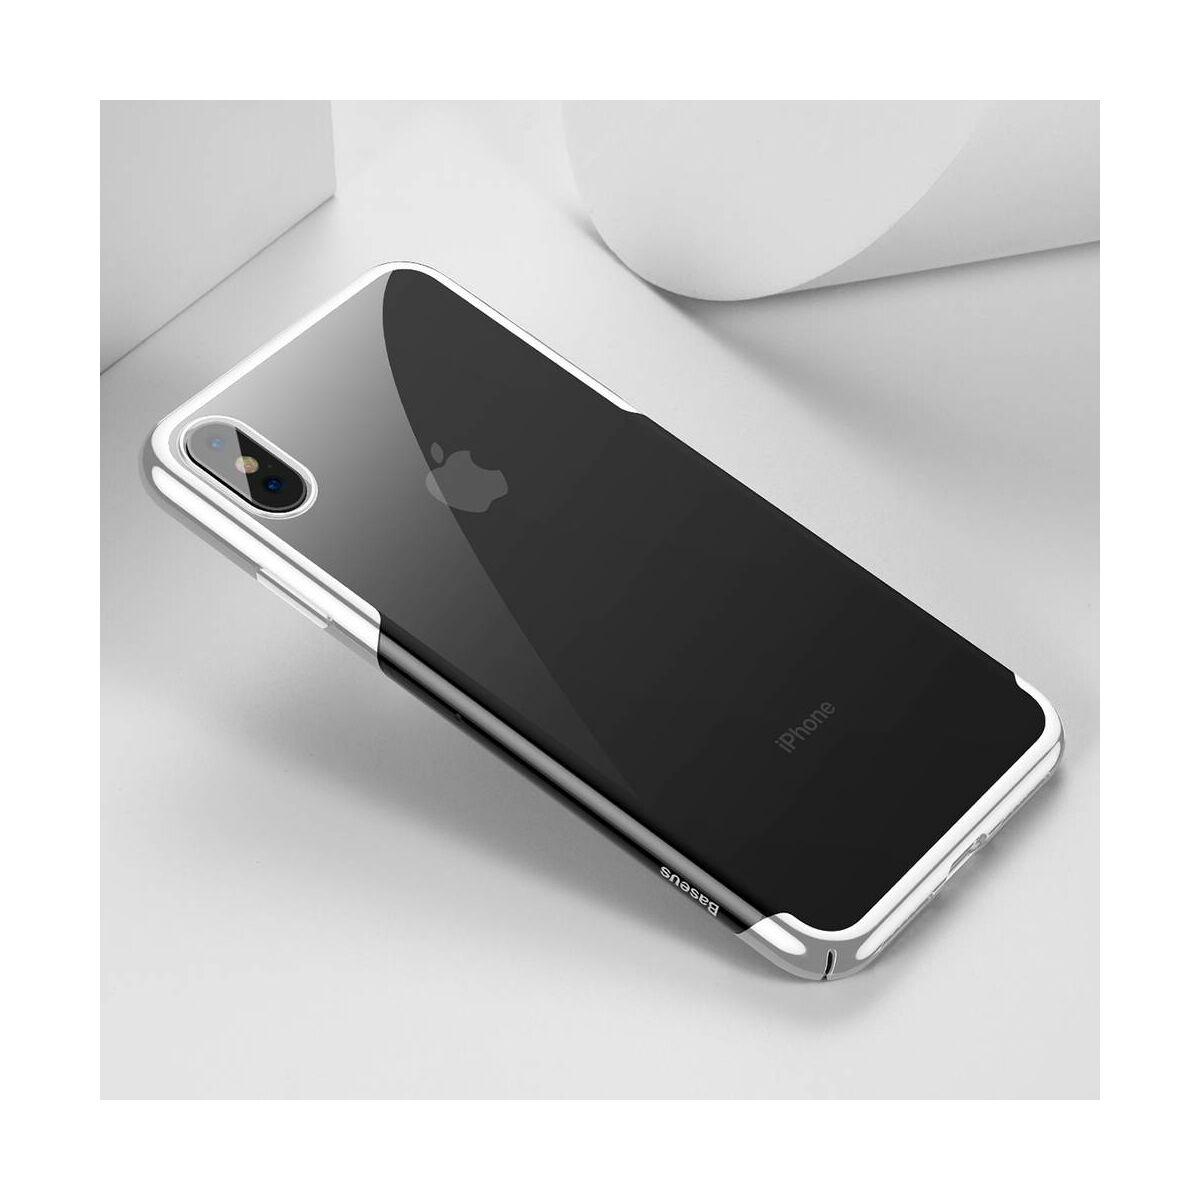 Baseus iPhone XS tok, Glitter, fehér (WIAPIPH58-DW02)